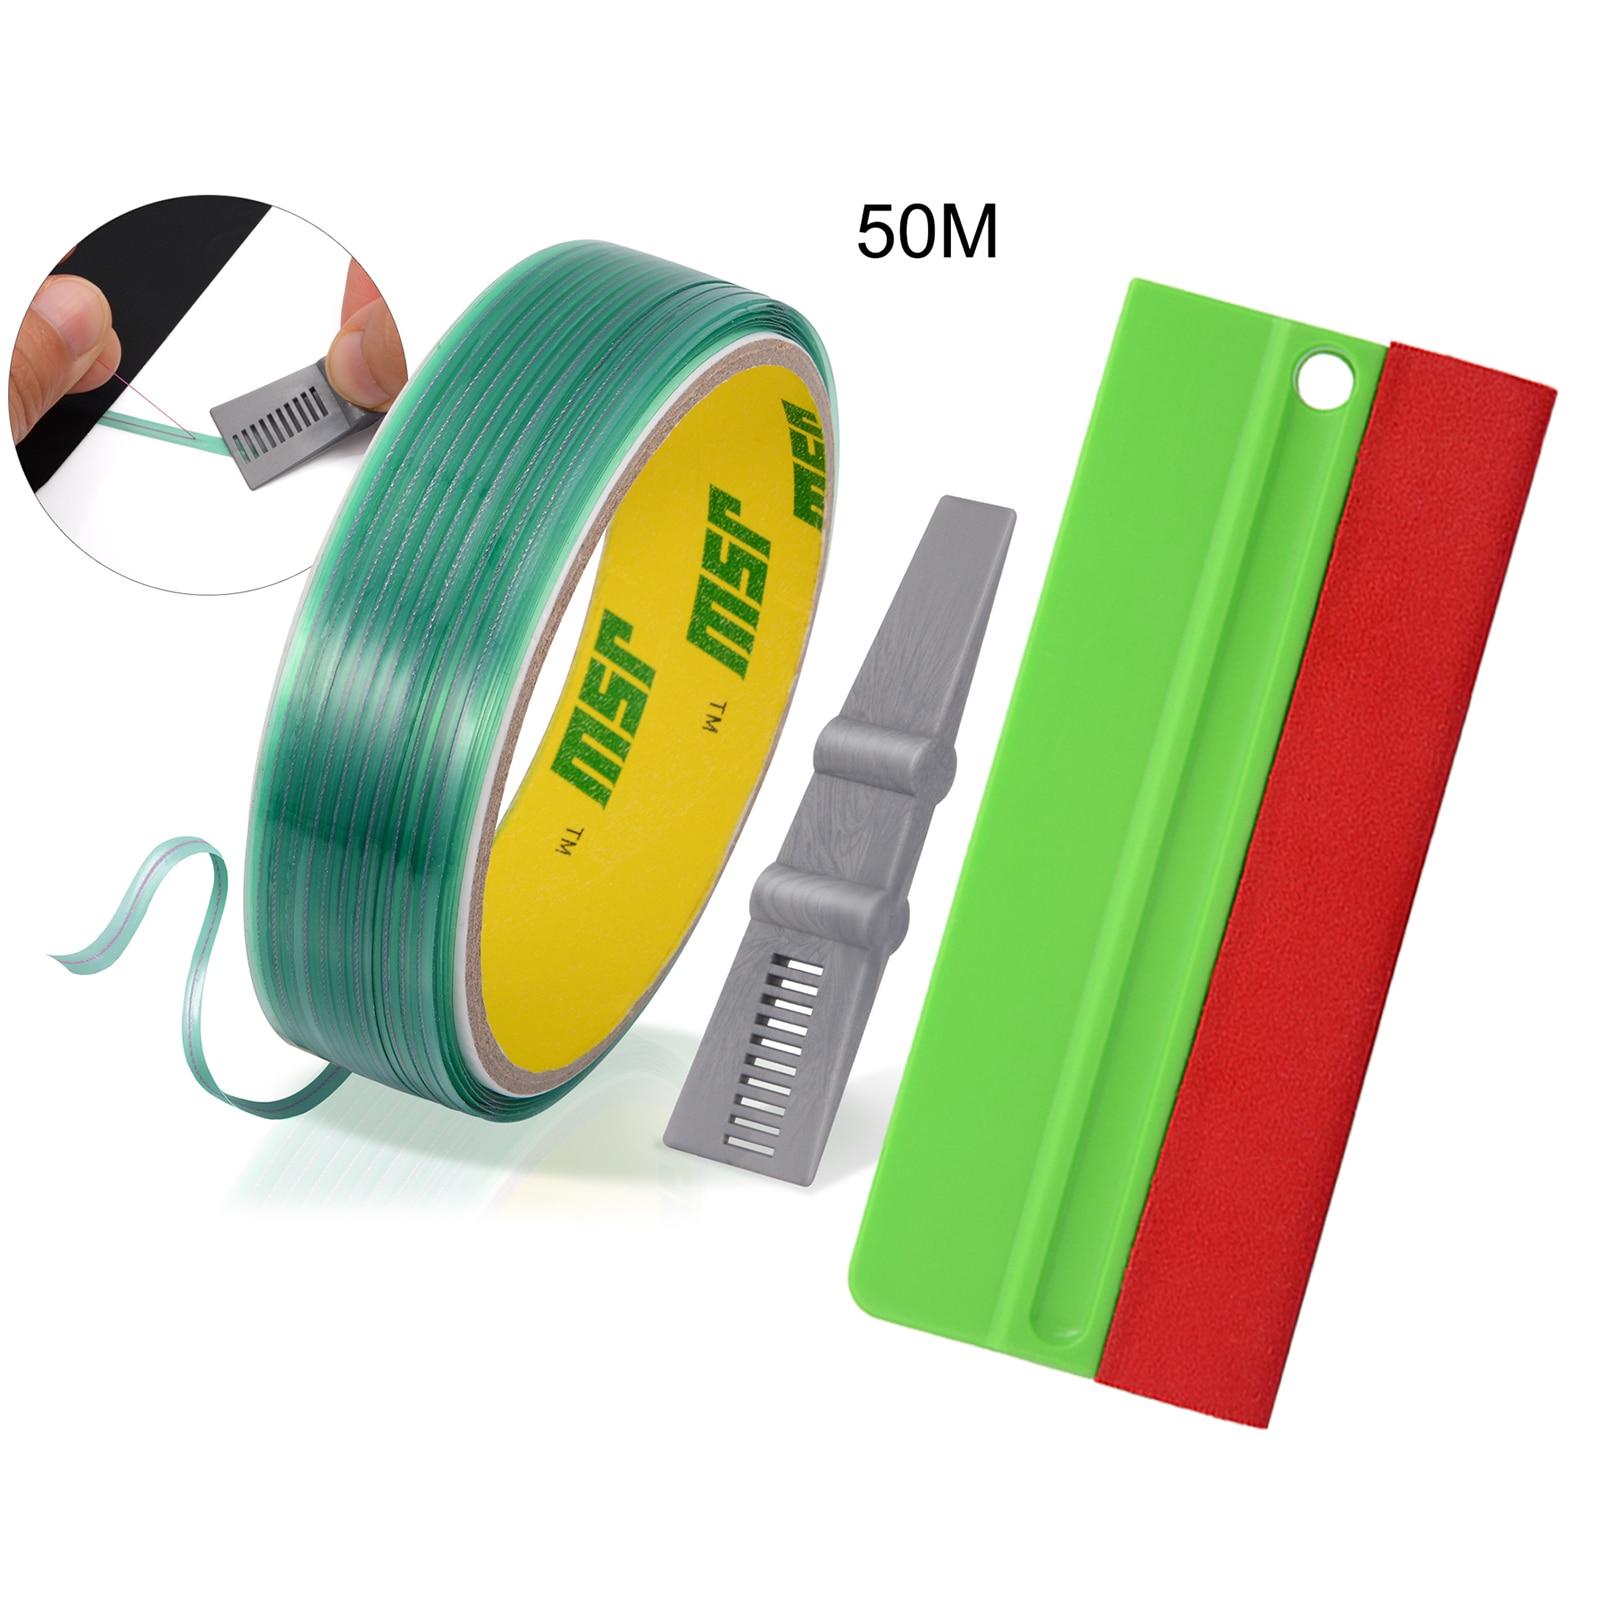 EHDIS Wrapping Vinyl Cutting Tape Car Film Print Scraper Edge Woven Felt Plastic Squeegee Knifeless Design Line Cutter Tool Set